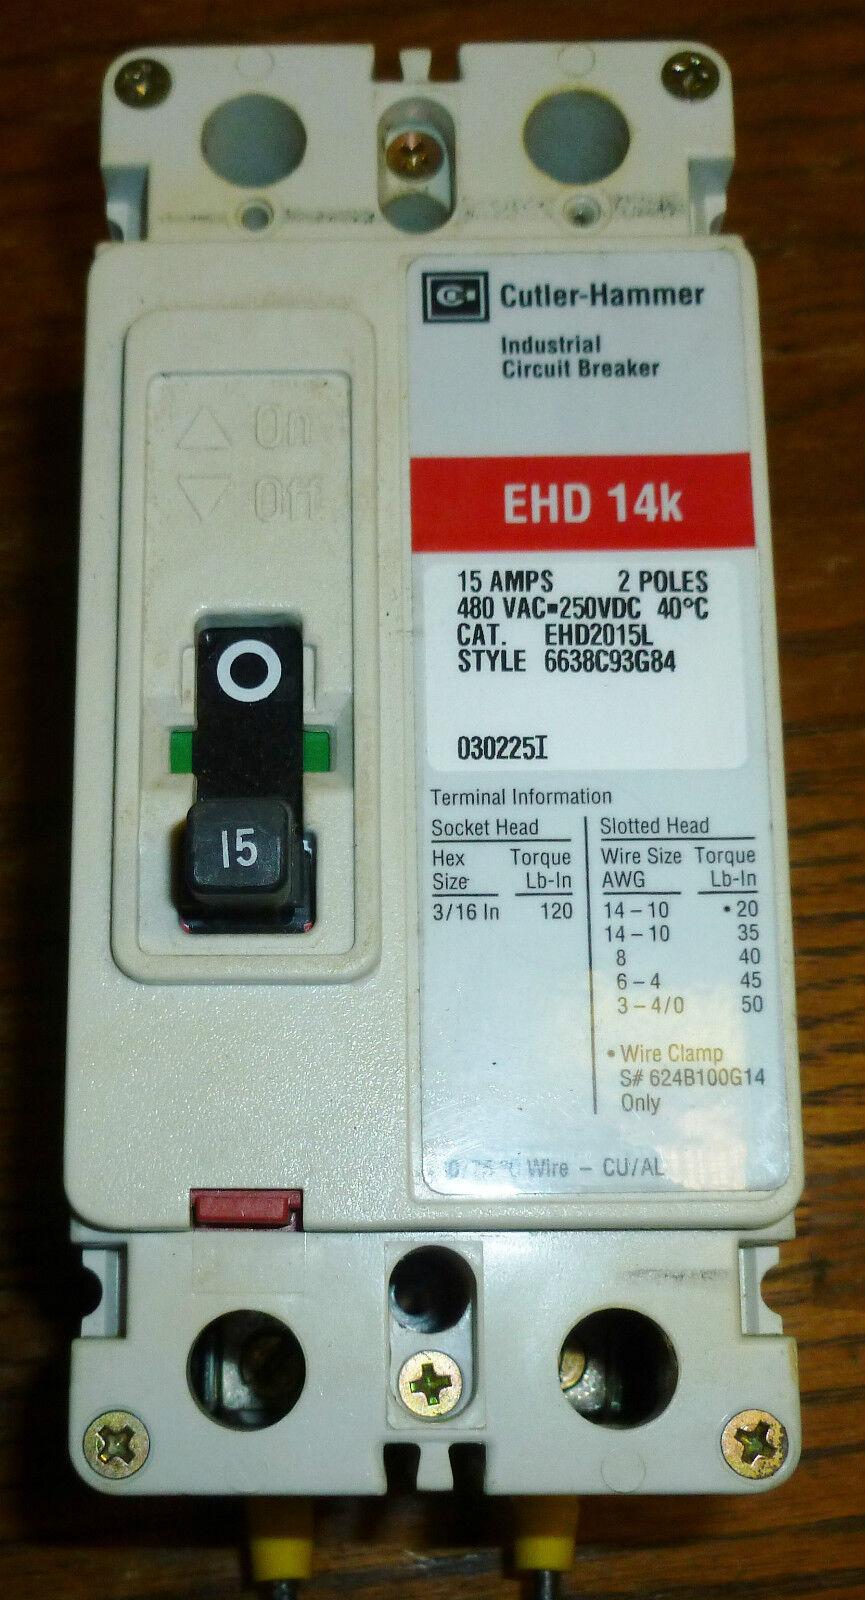 Cutler-Hammer EHD 14k Industrial Circuit Breaker 100amps 3 Poles | eBay